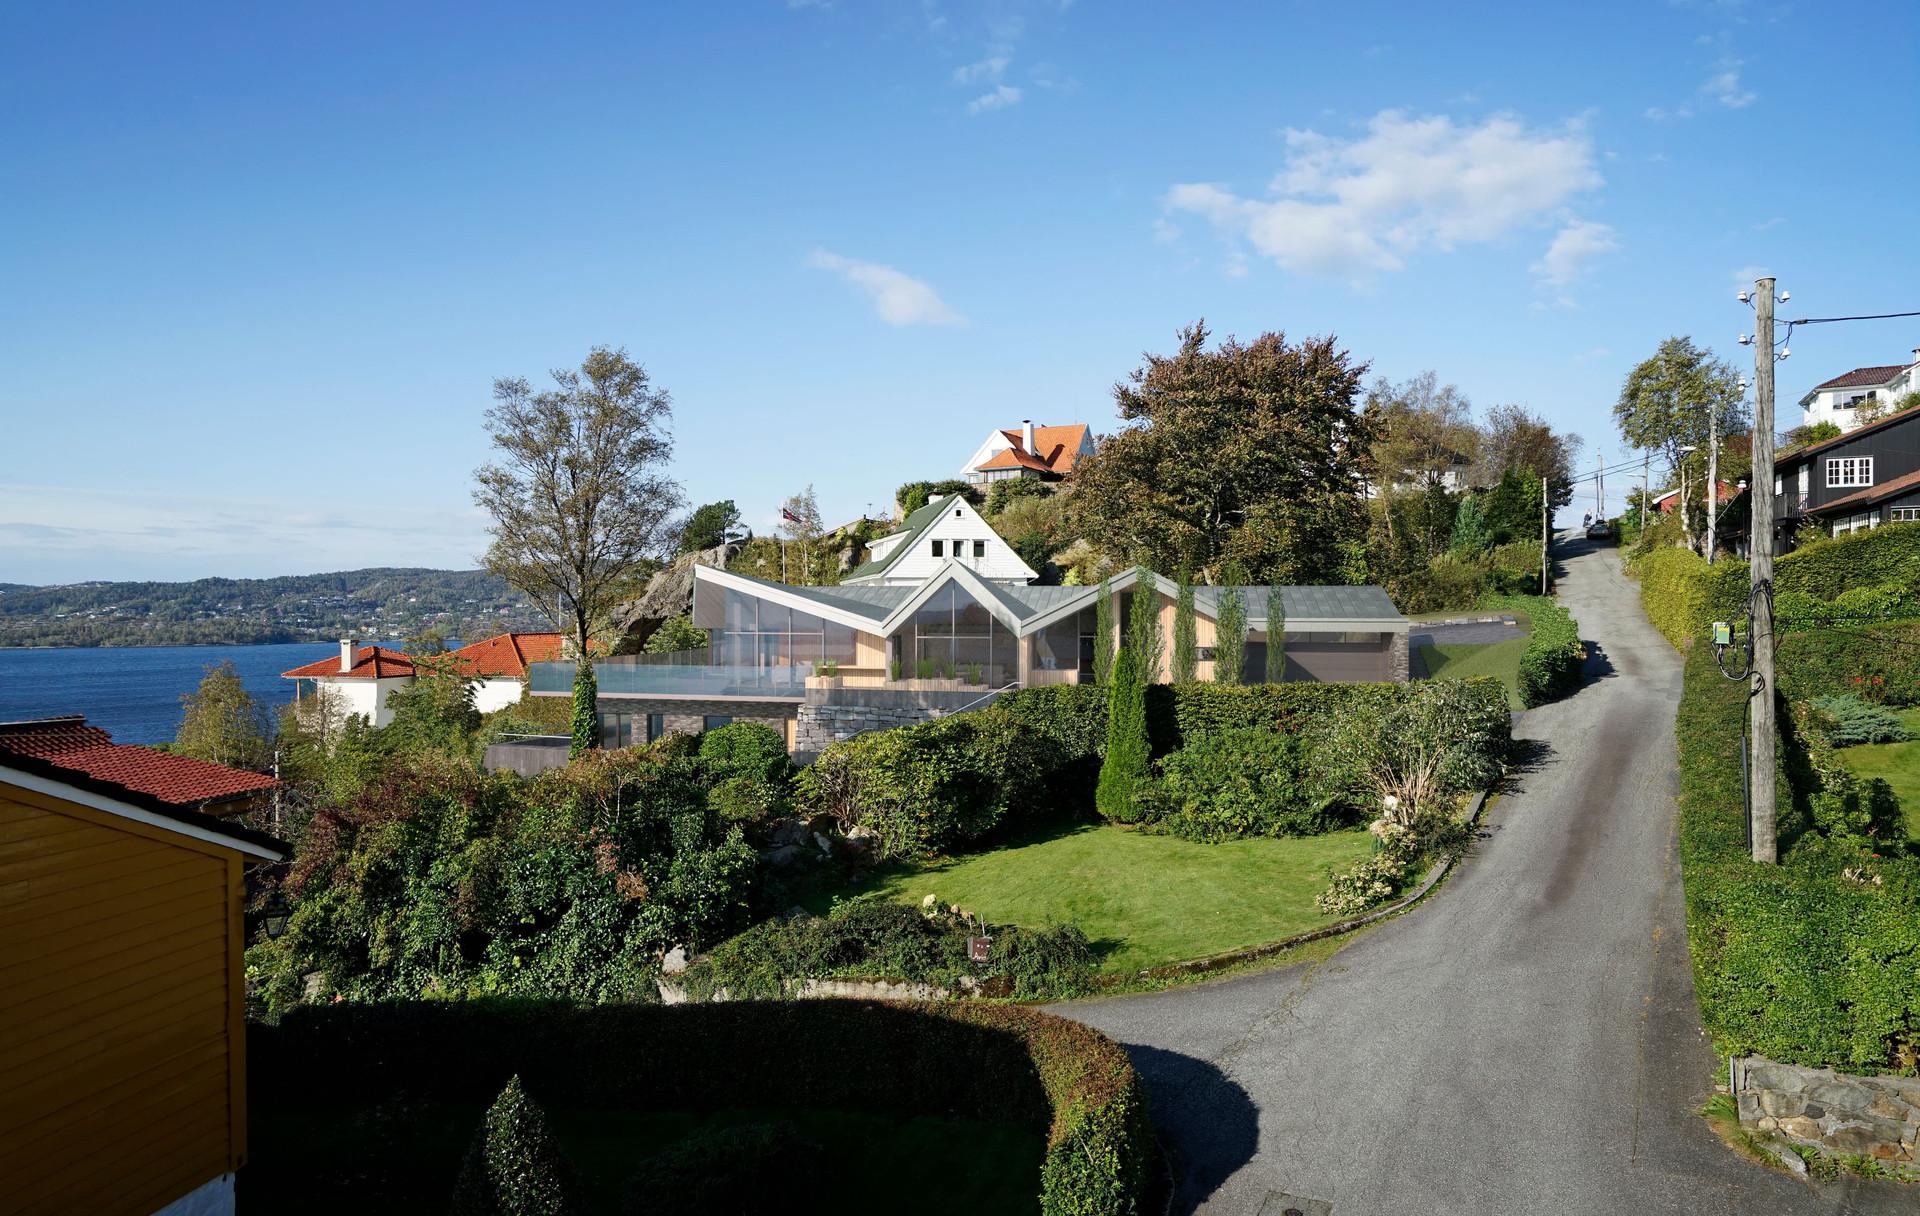 01-Prosjektert-bolig-Hellebakken10-Berge